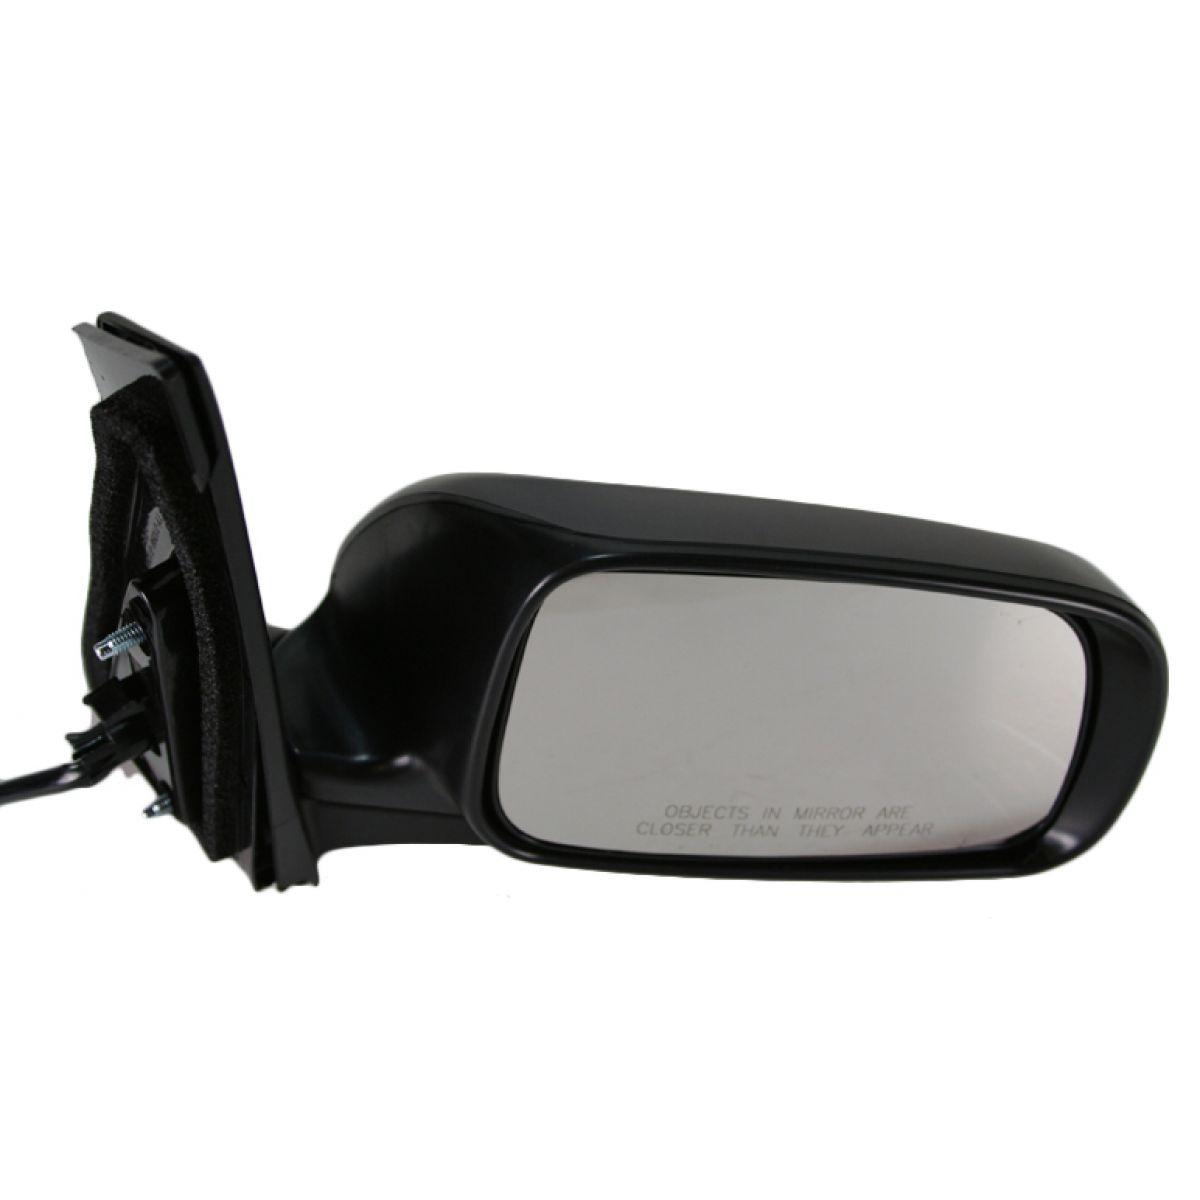 Power Side View Mirror Glass Housing Heated 04 10 Toyota Sienna Ebay